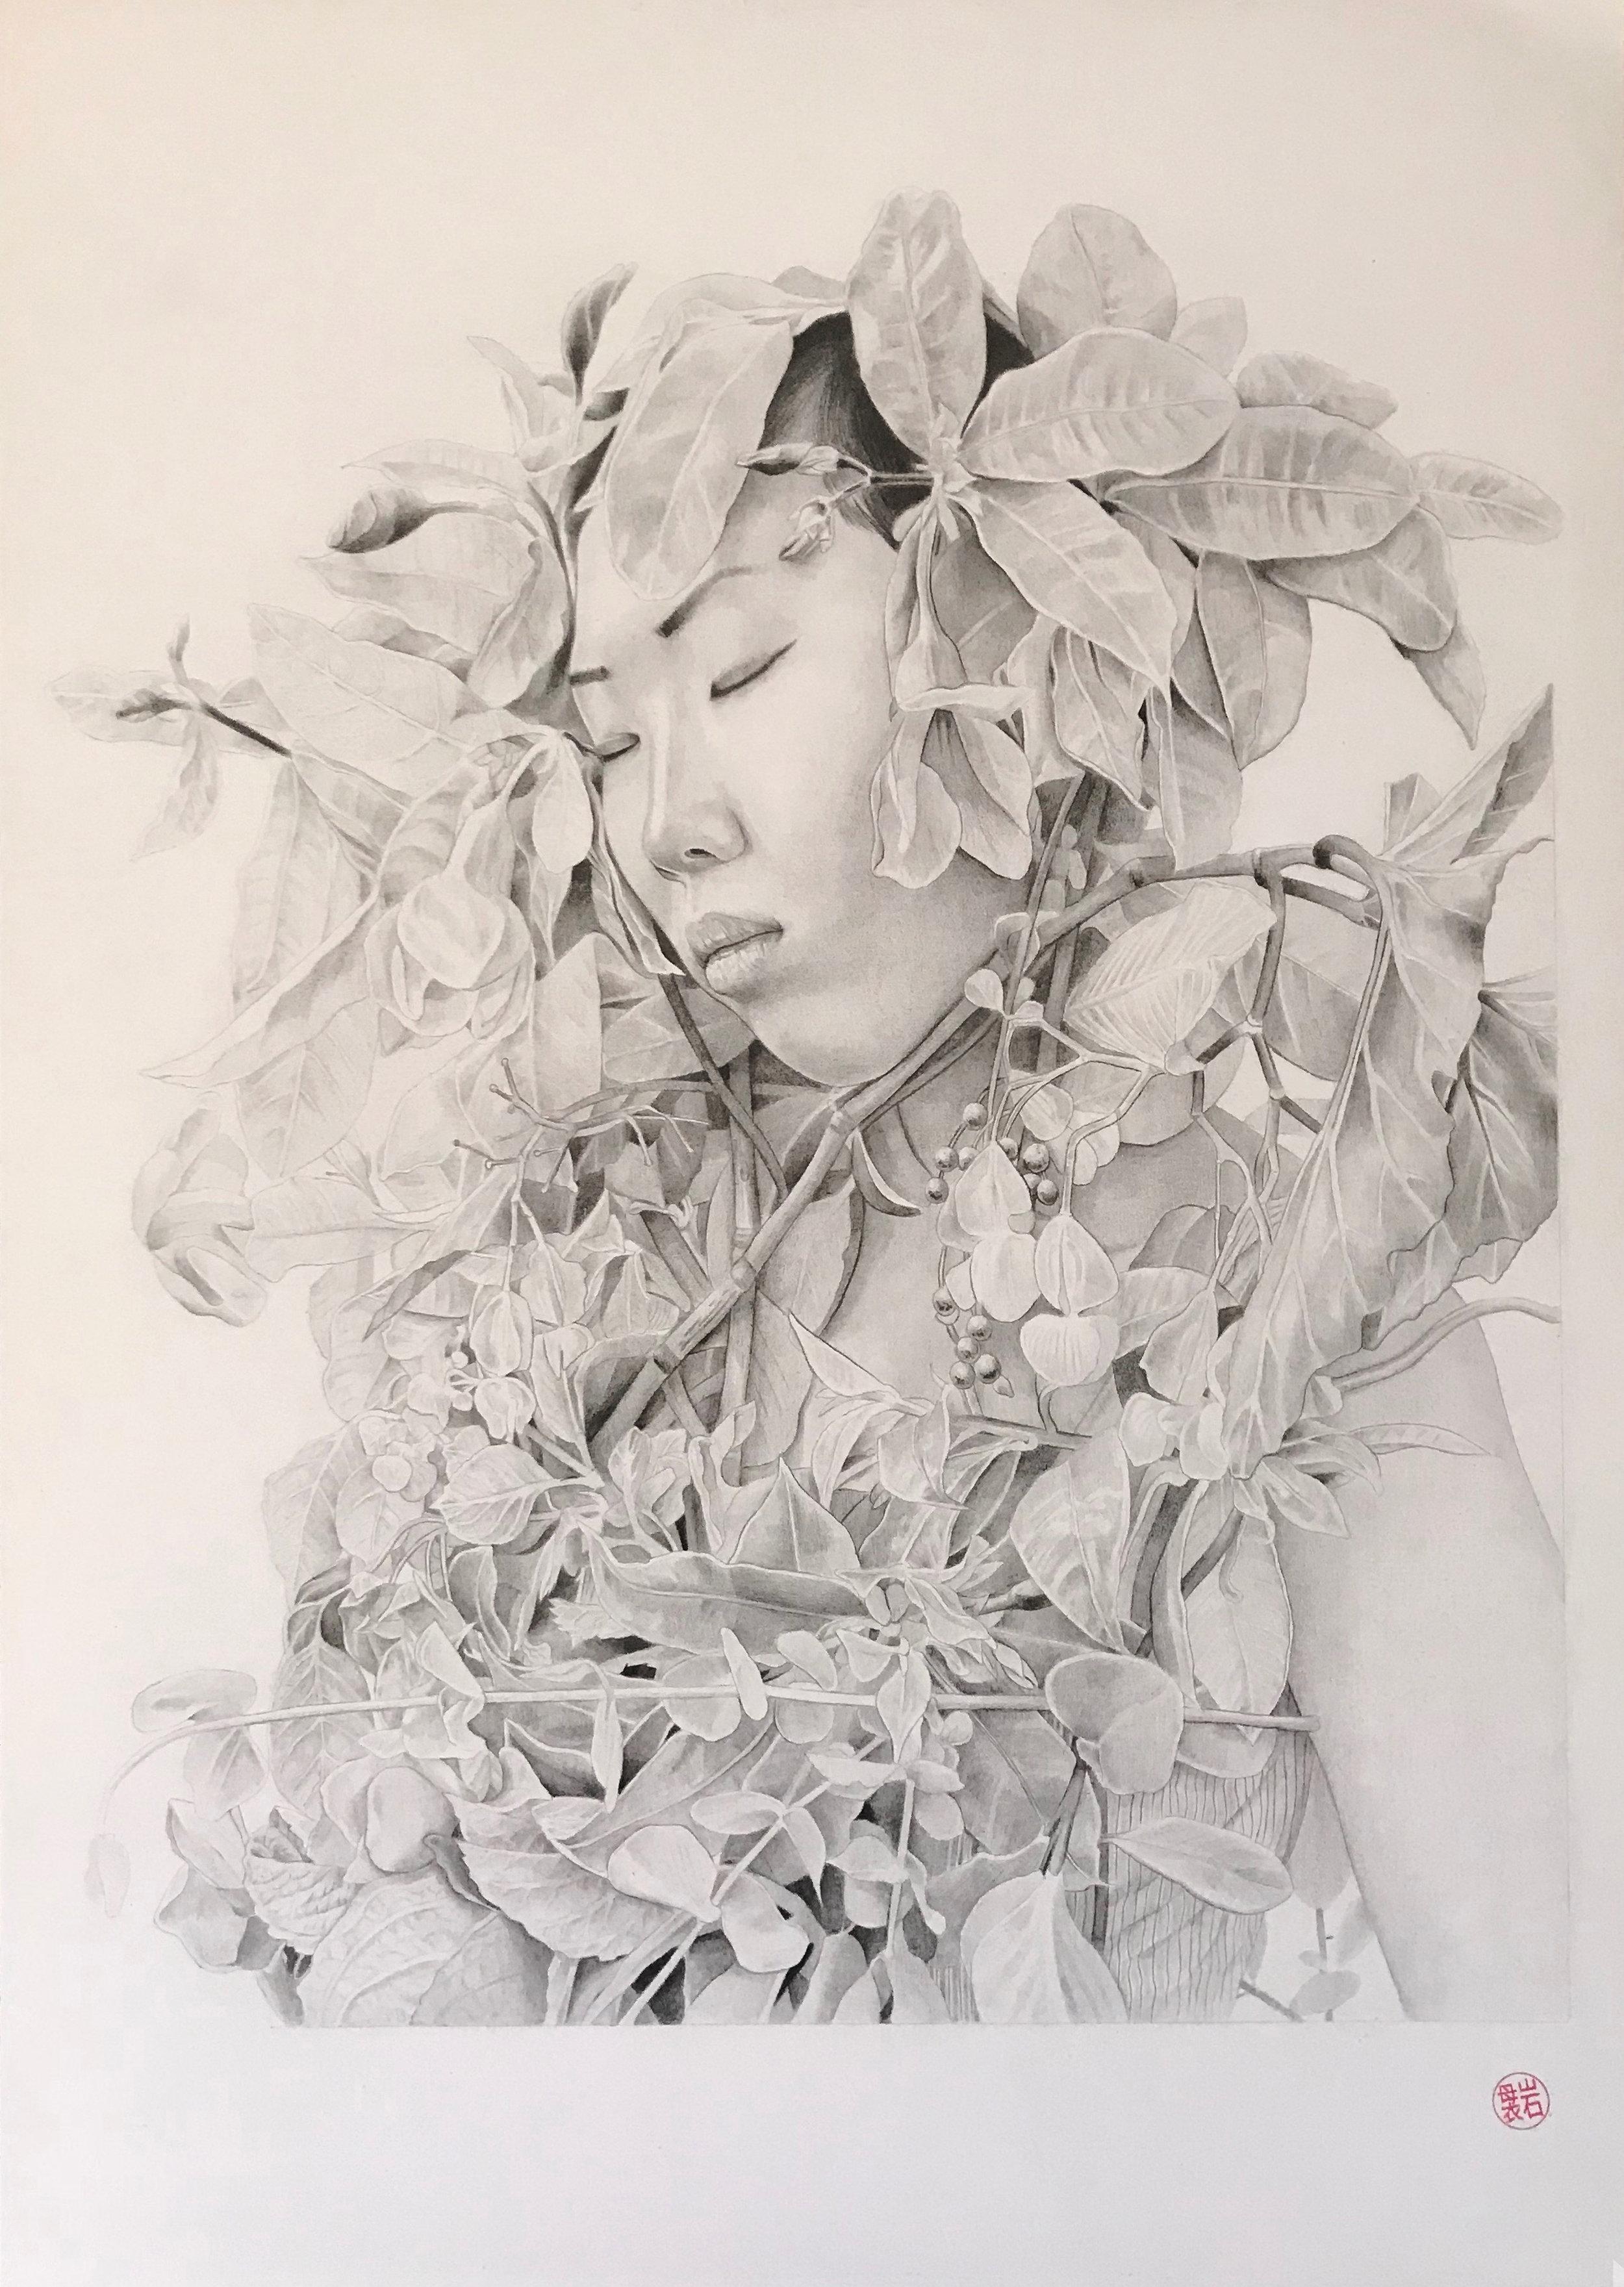 Study 02, Phantom Pain by Dante Horoiwa